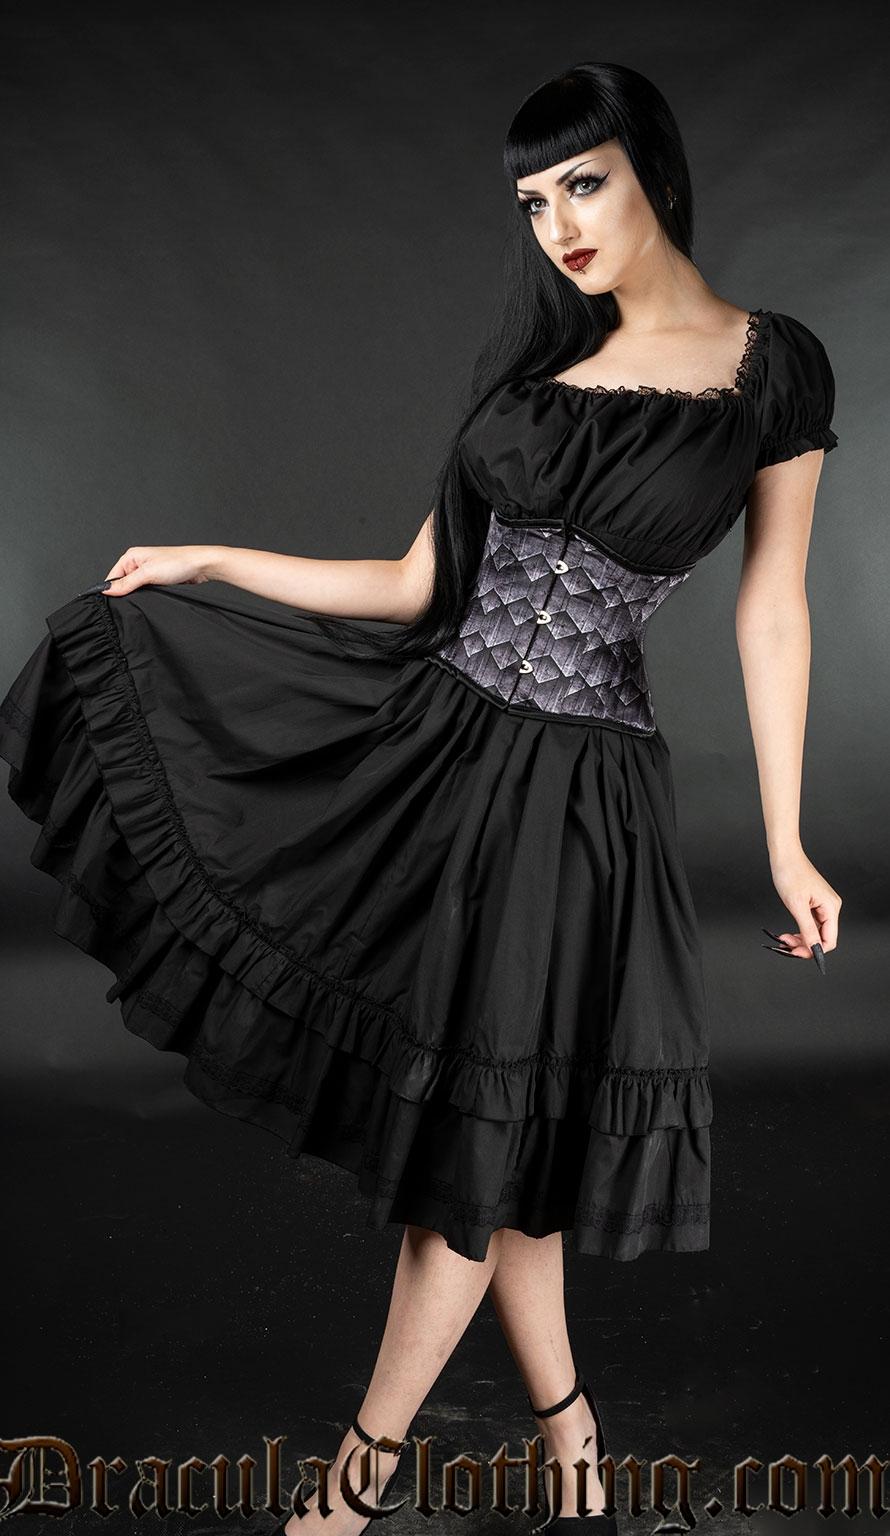 Black Gothabilly Dress